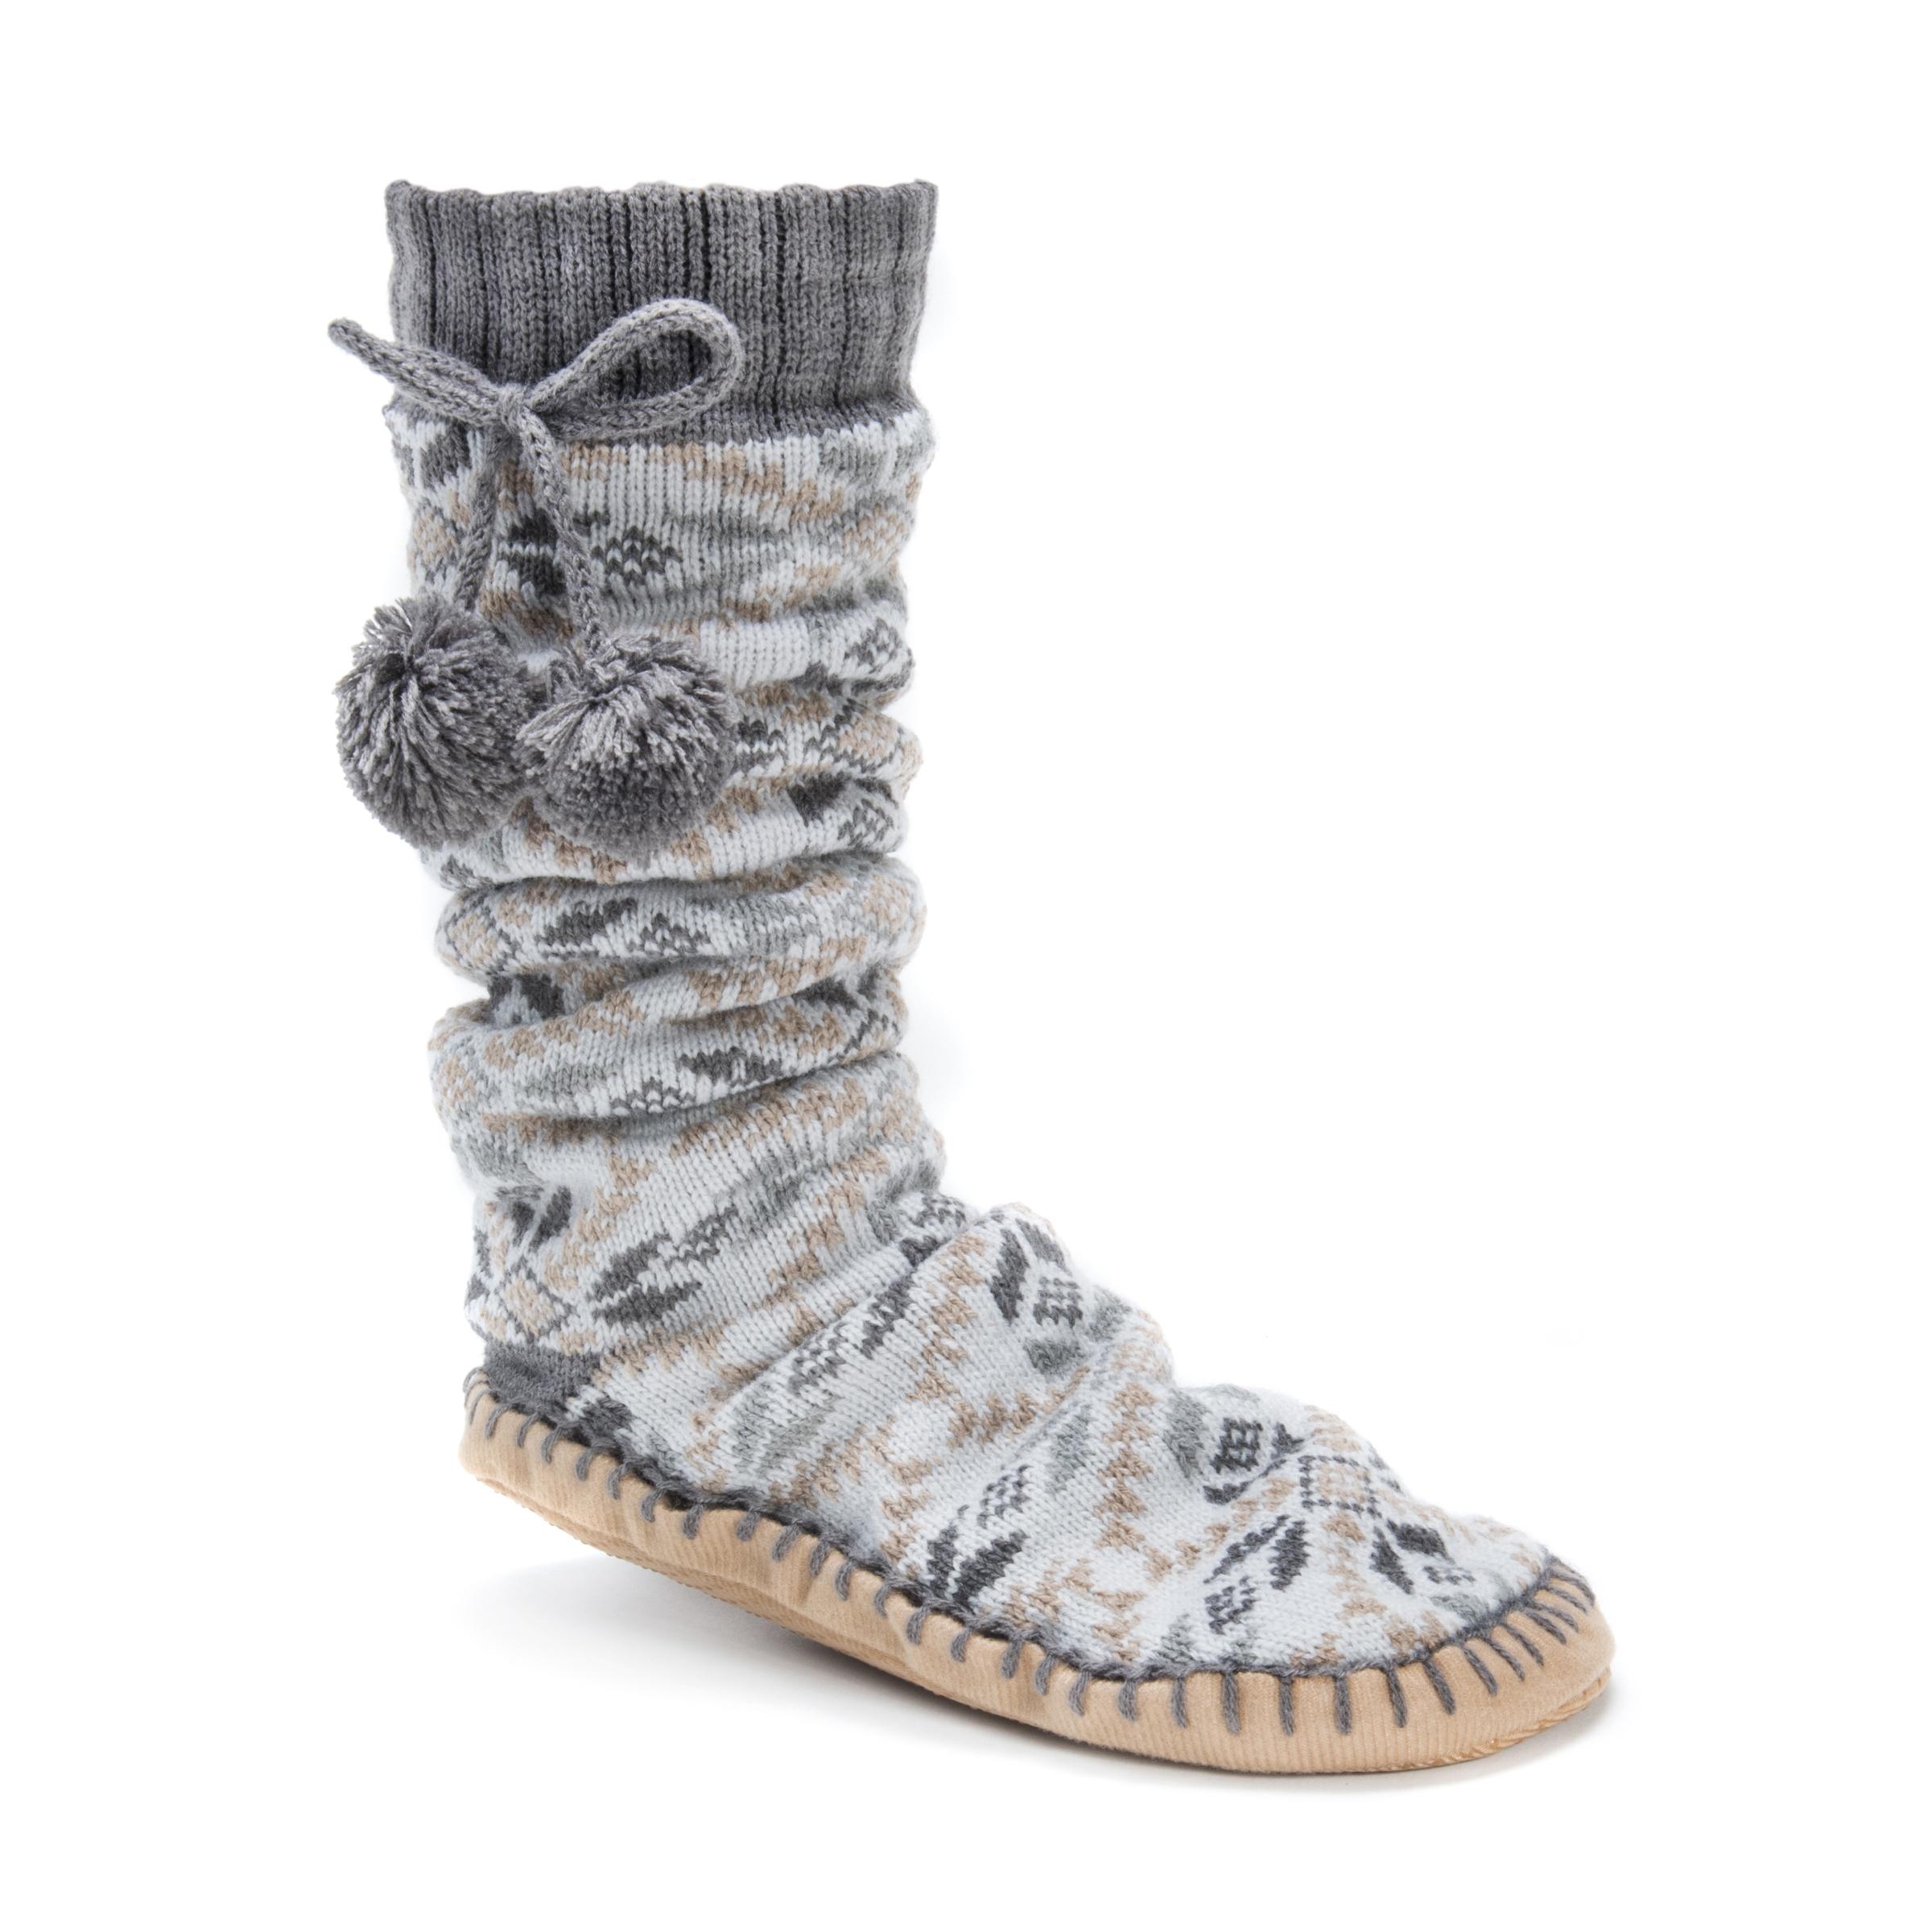 MUK LUKS® Women's Slipper Socks with Poms – Ash | Slippers.com - Shop Comfy